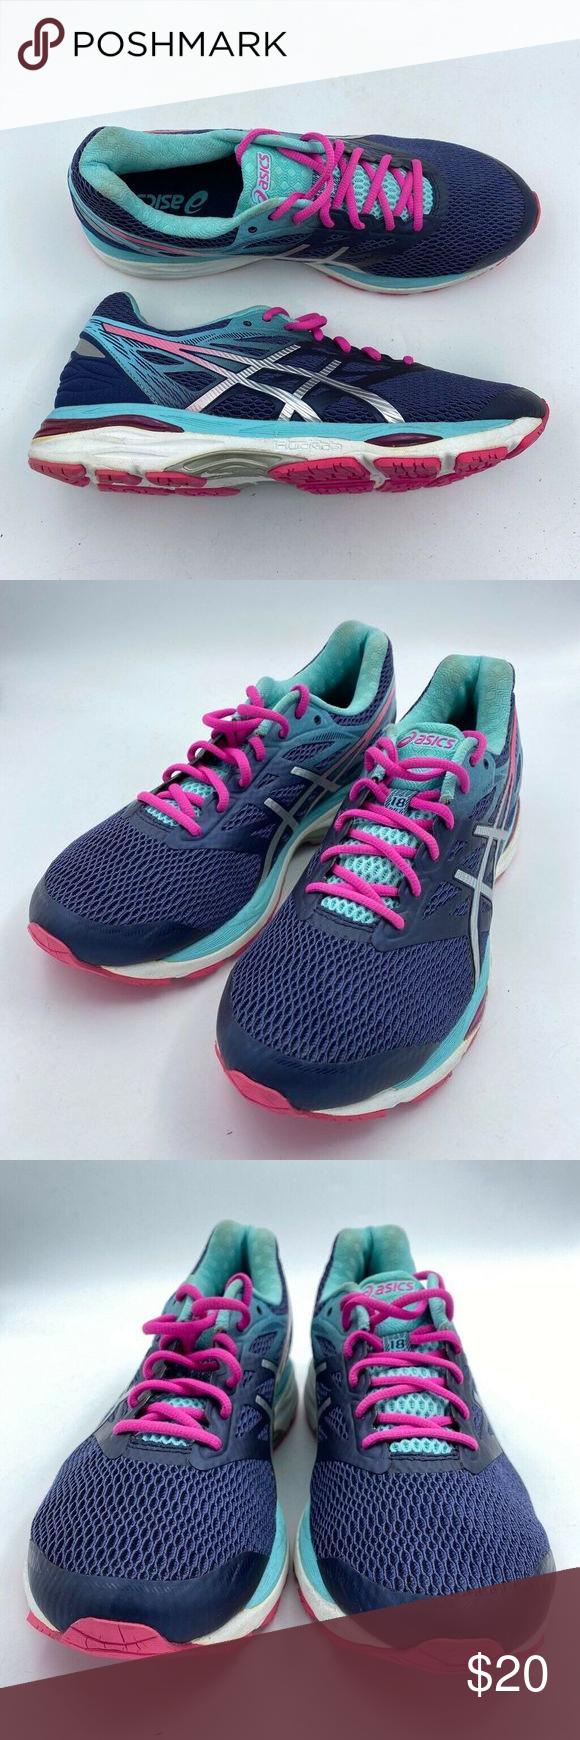 Asics Womens Gel Cumulus 18 Running Shoes 12 Running Shoes Asics Shoe Height